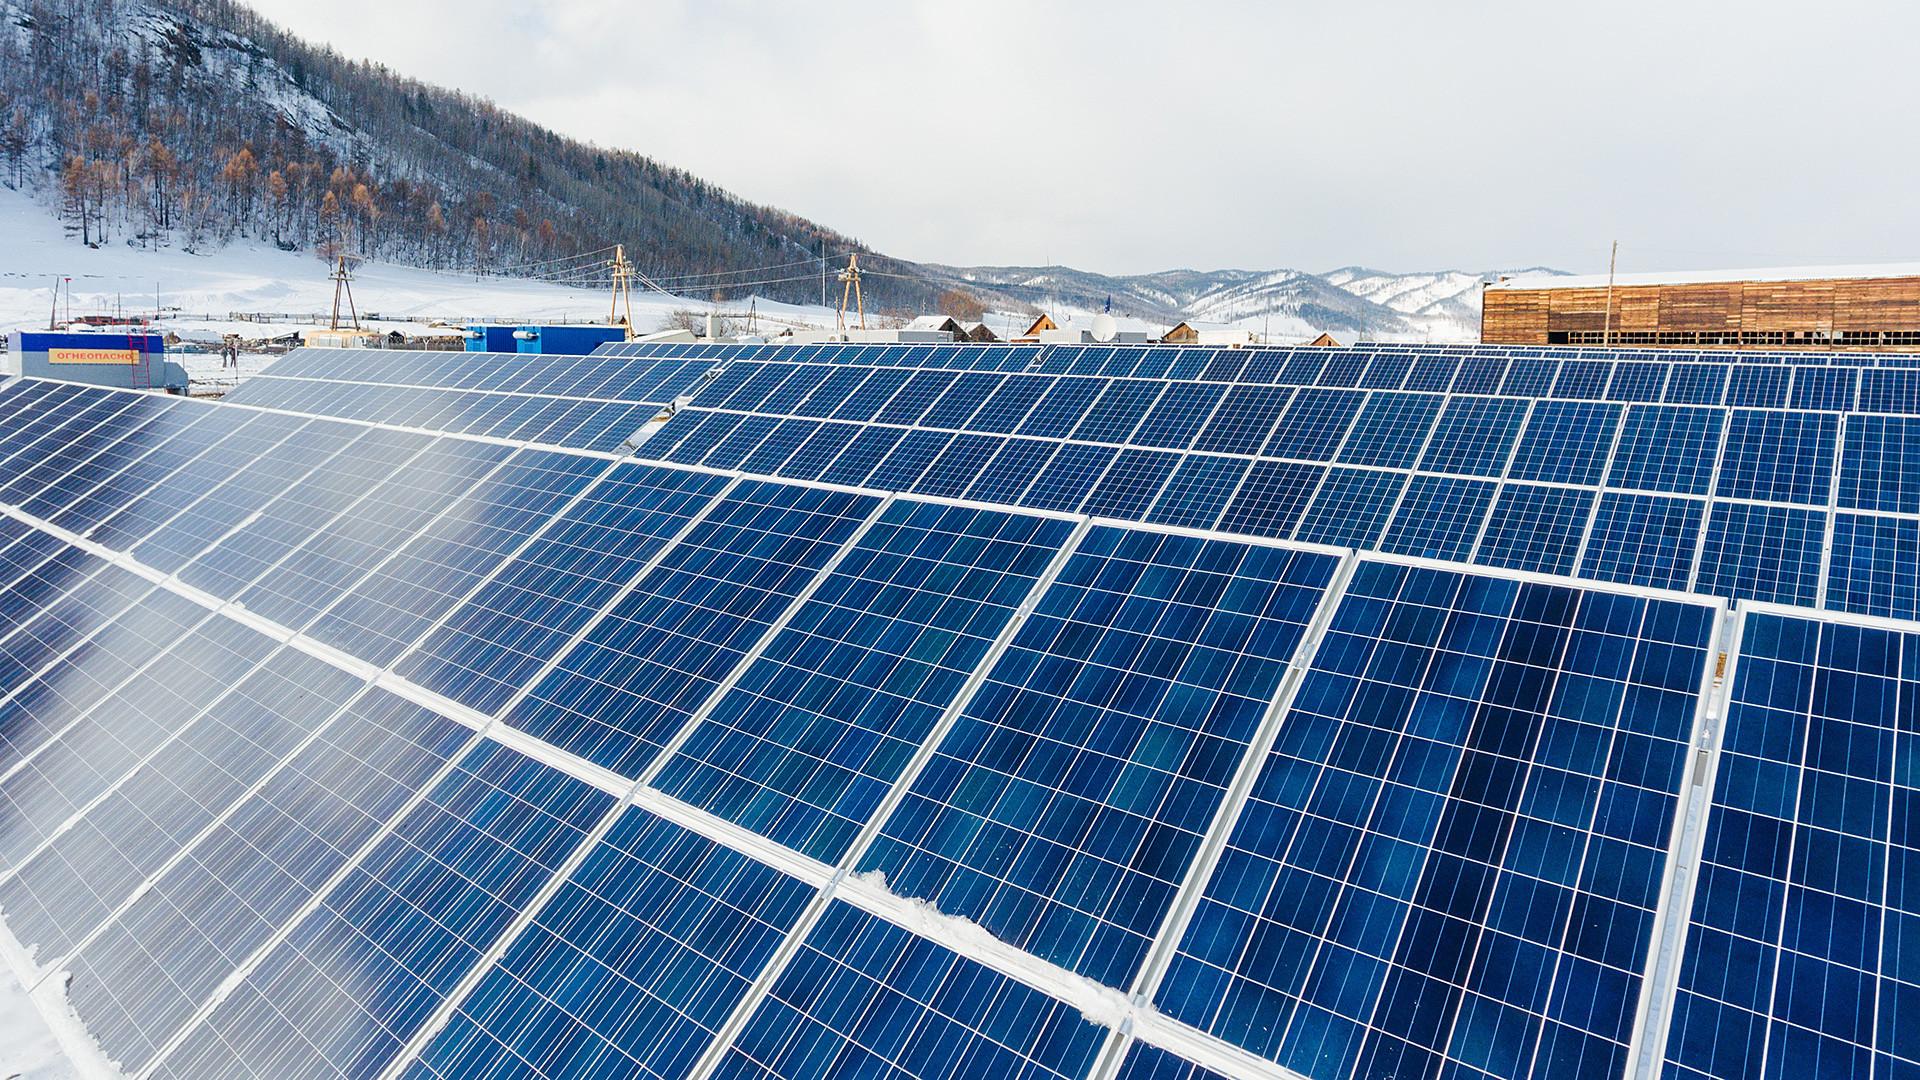 Usina de energia solar em Menza